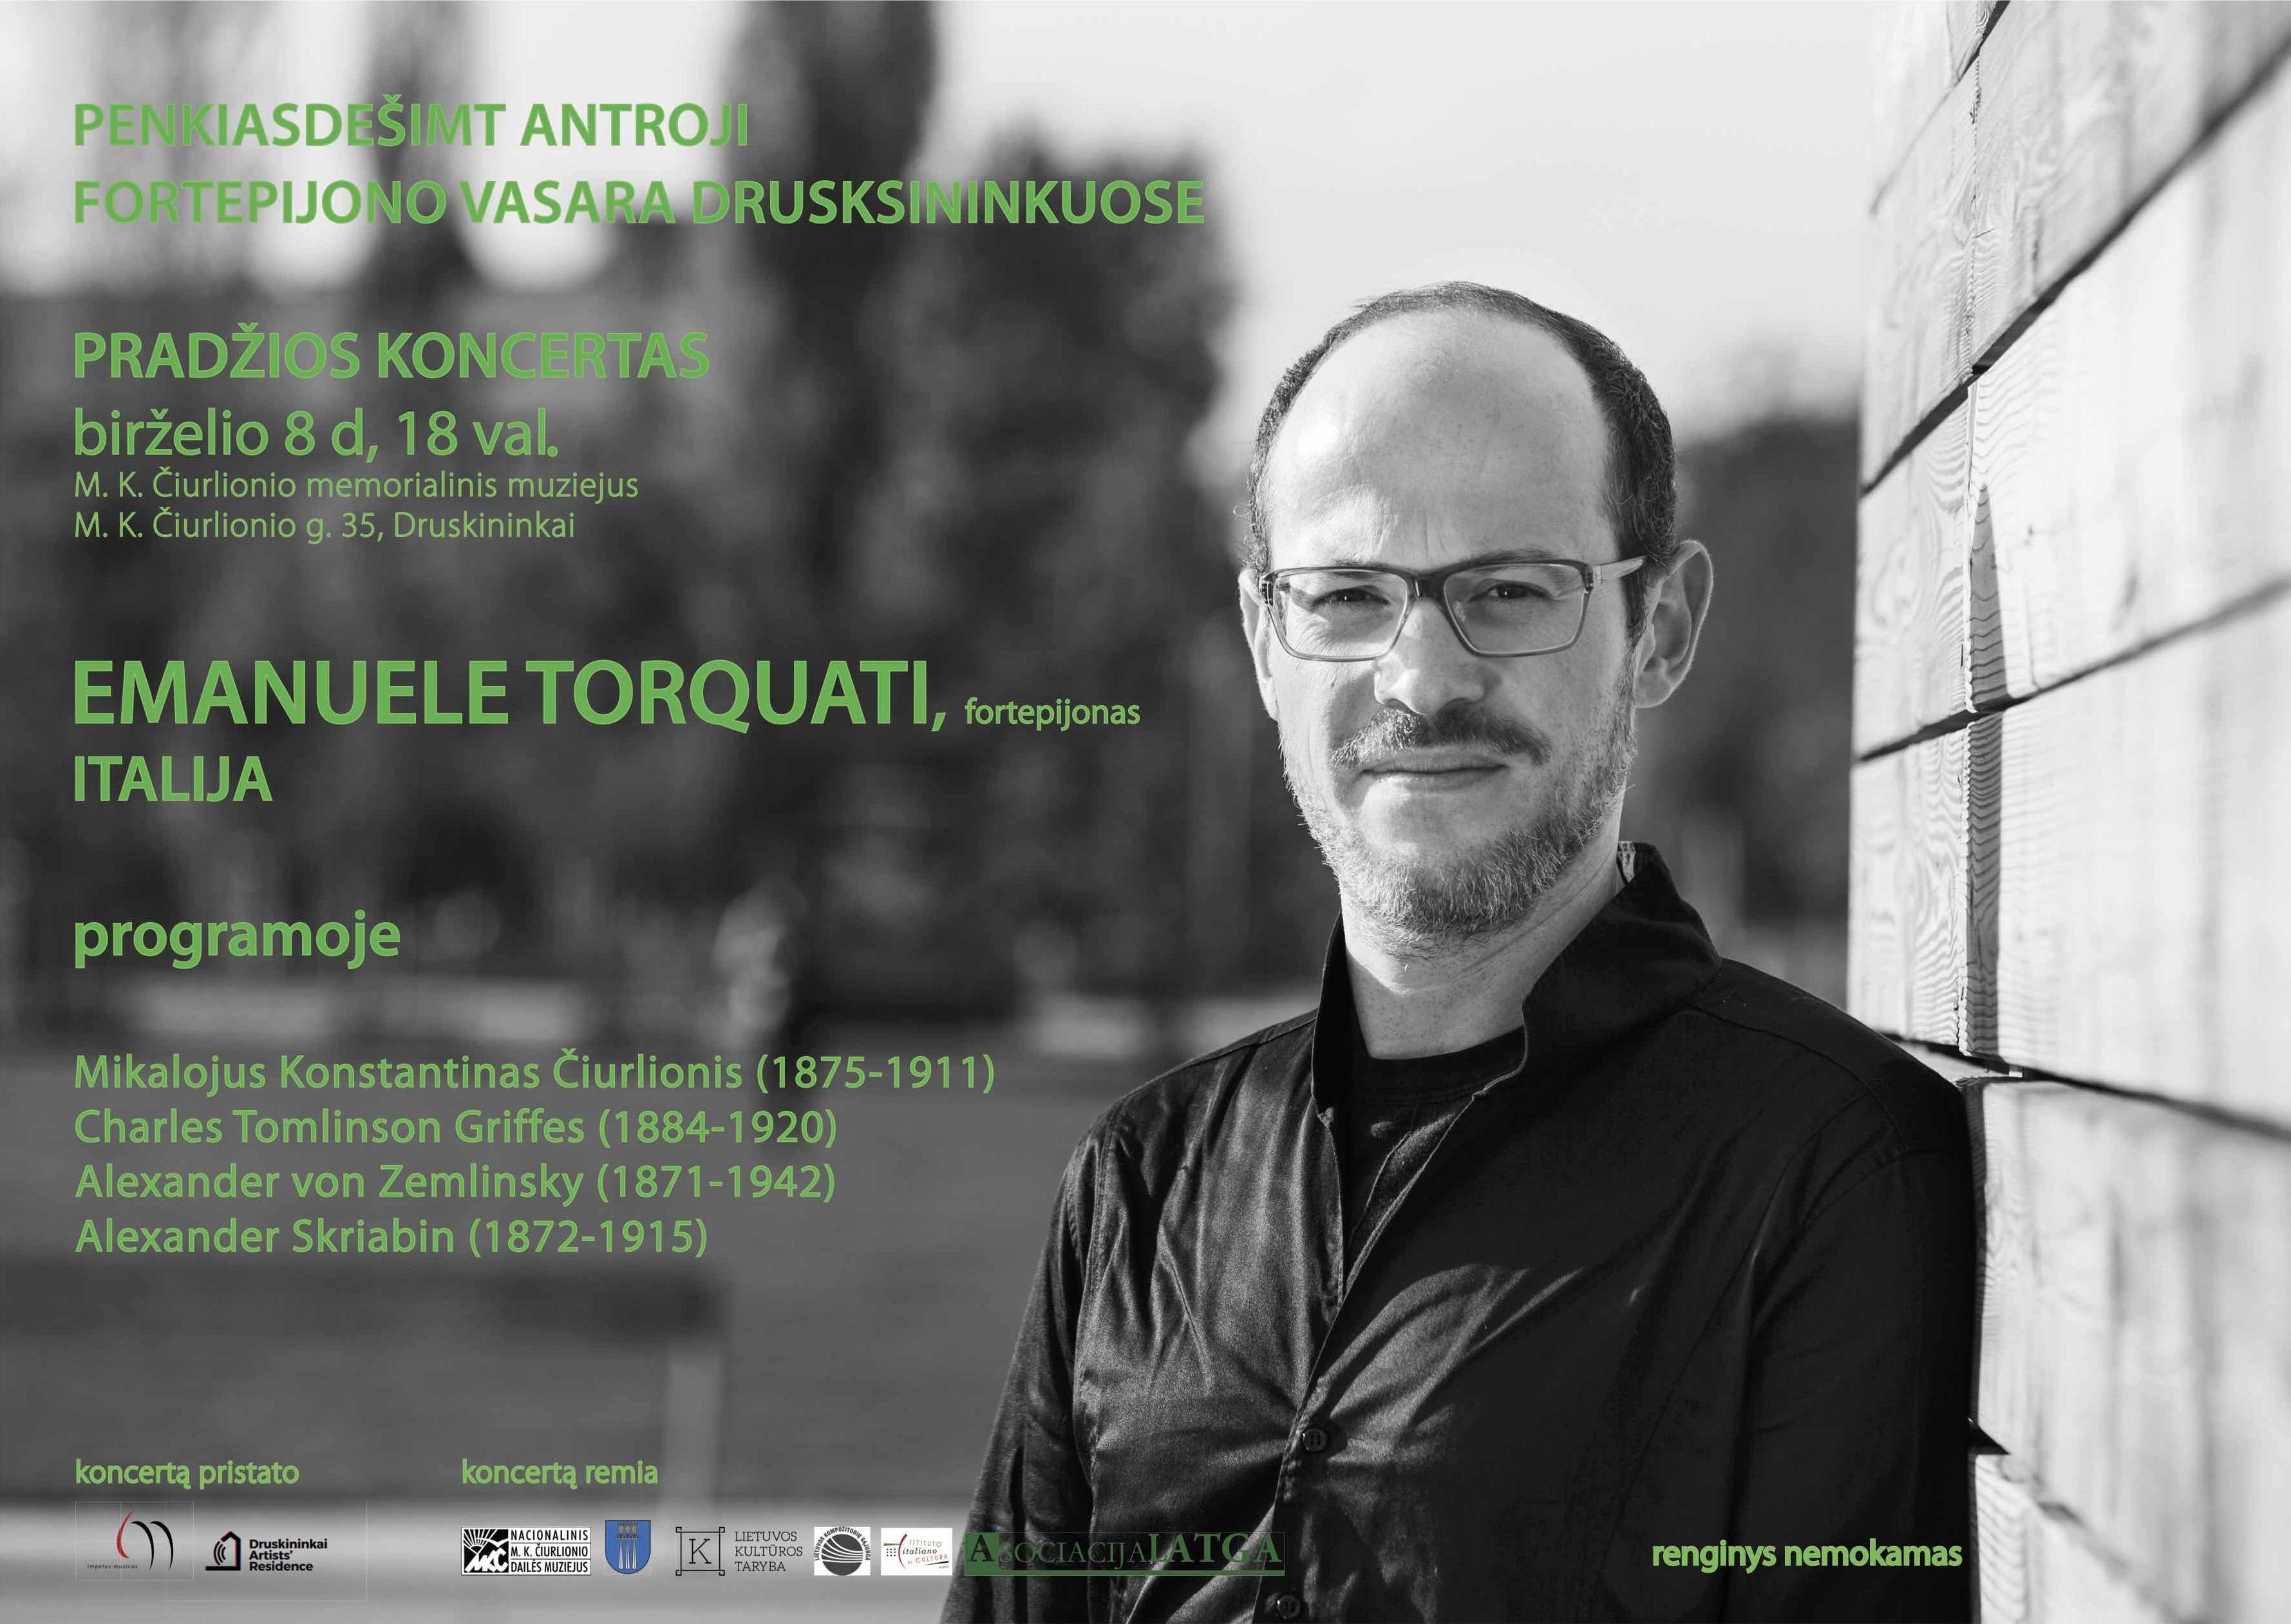 Emanuele Torquati plakatas Druskininkai